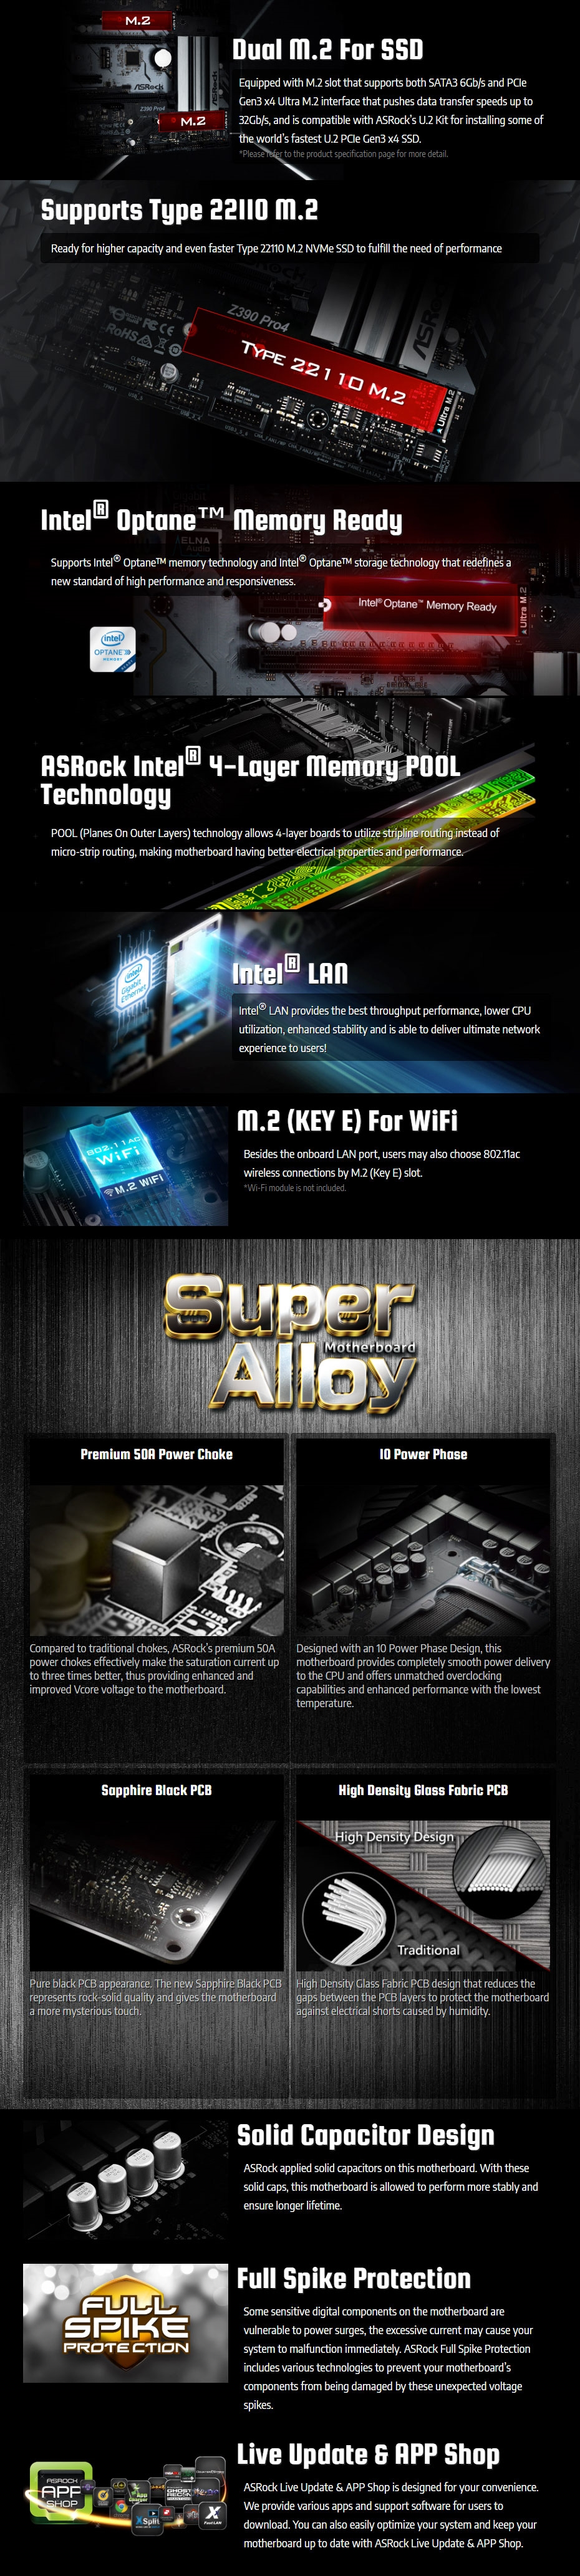 ASRock Z390 Pro4 ATX Motherboard